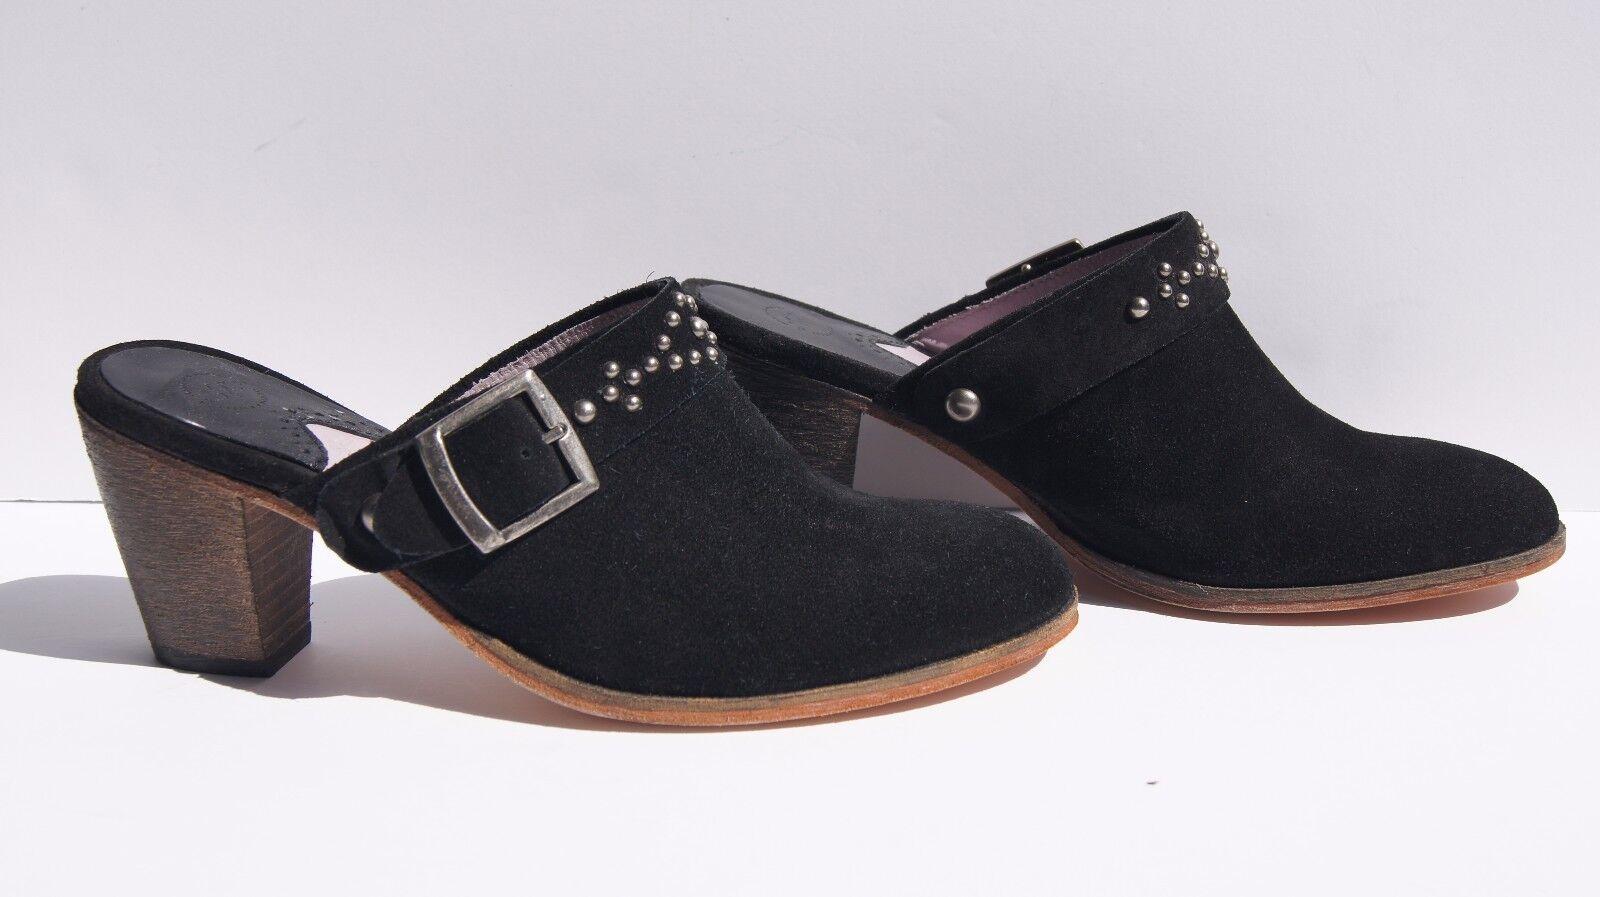 Johnston and Murphy Women's Black Suede Studded Metal Buckle Block Heel shoes 7.5